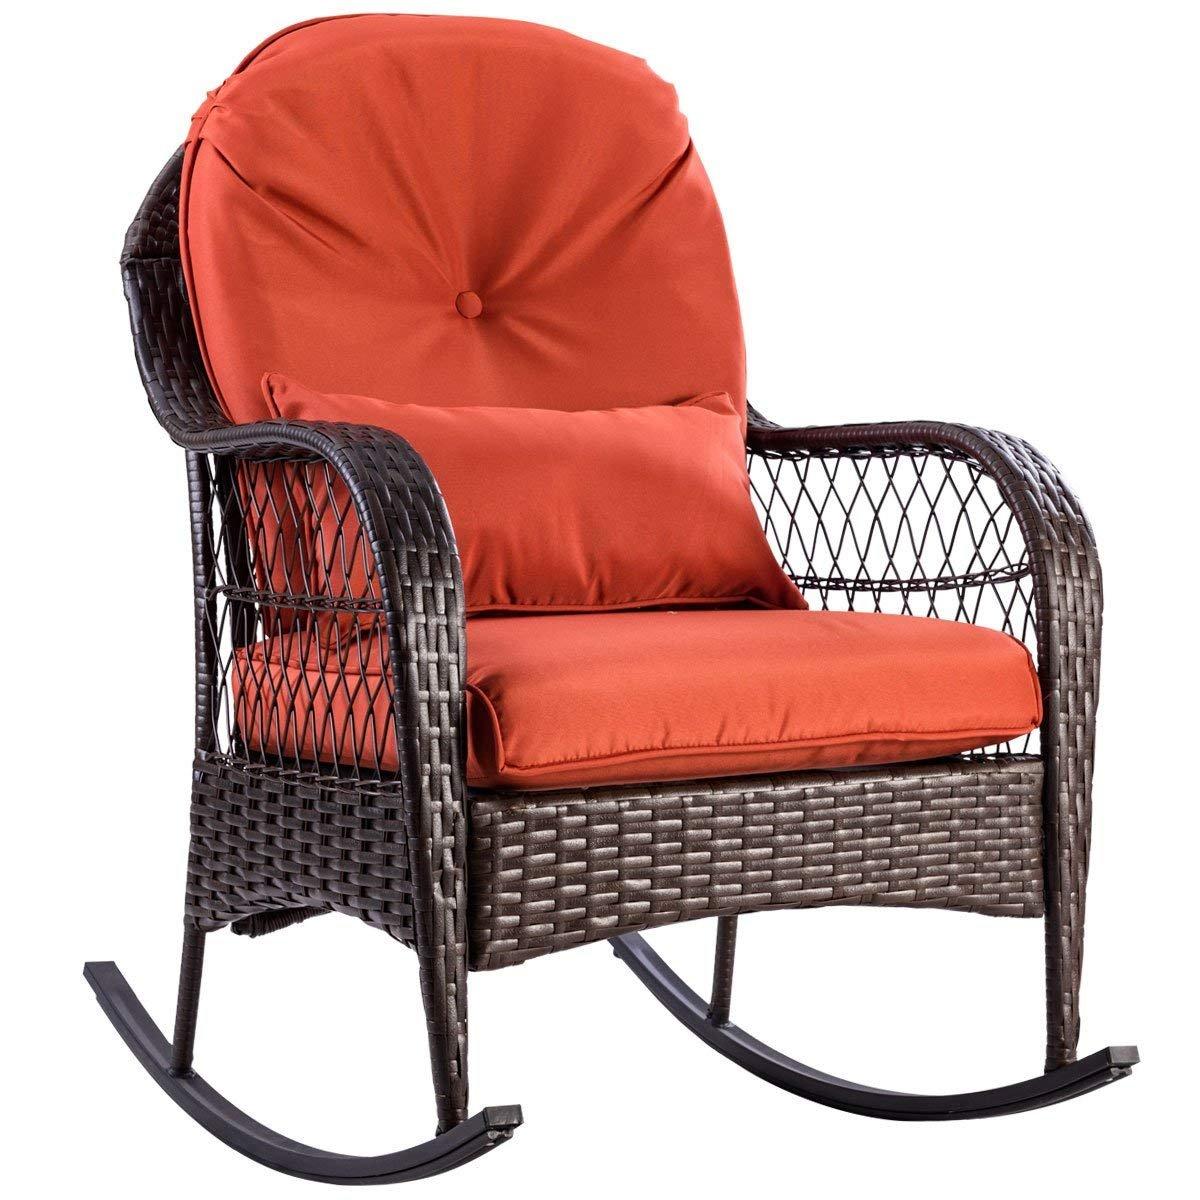 Tangkula Wicker Rocking Chair Outdoor Porch Garden Lawn Deck Wicker Rocker Patio Furniture w Cushion Colourful Cushion